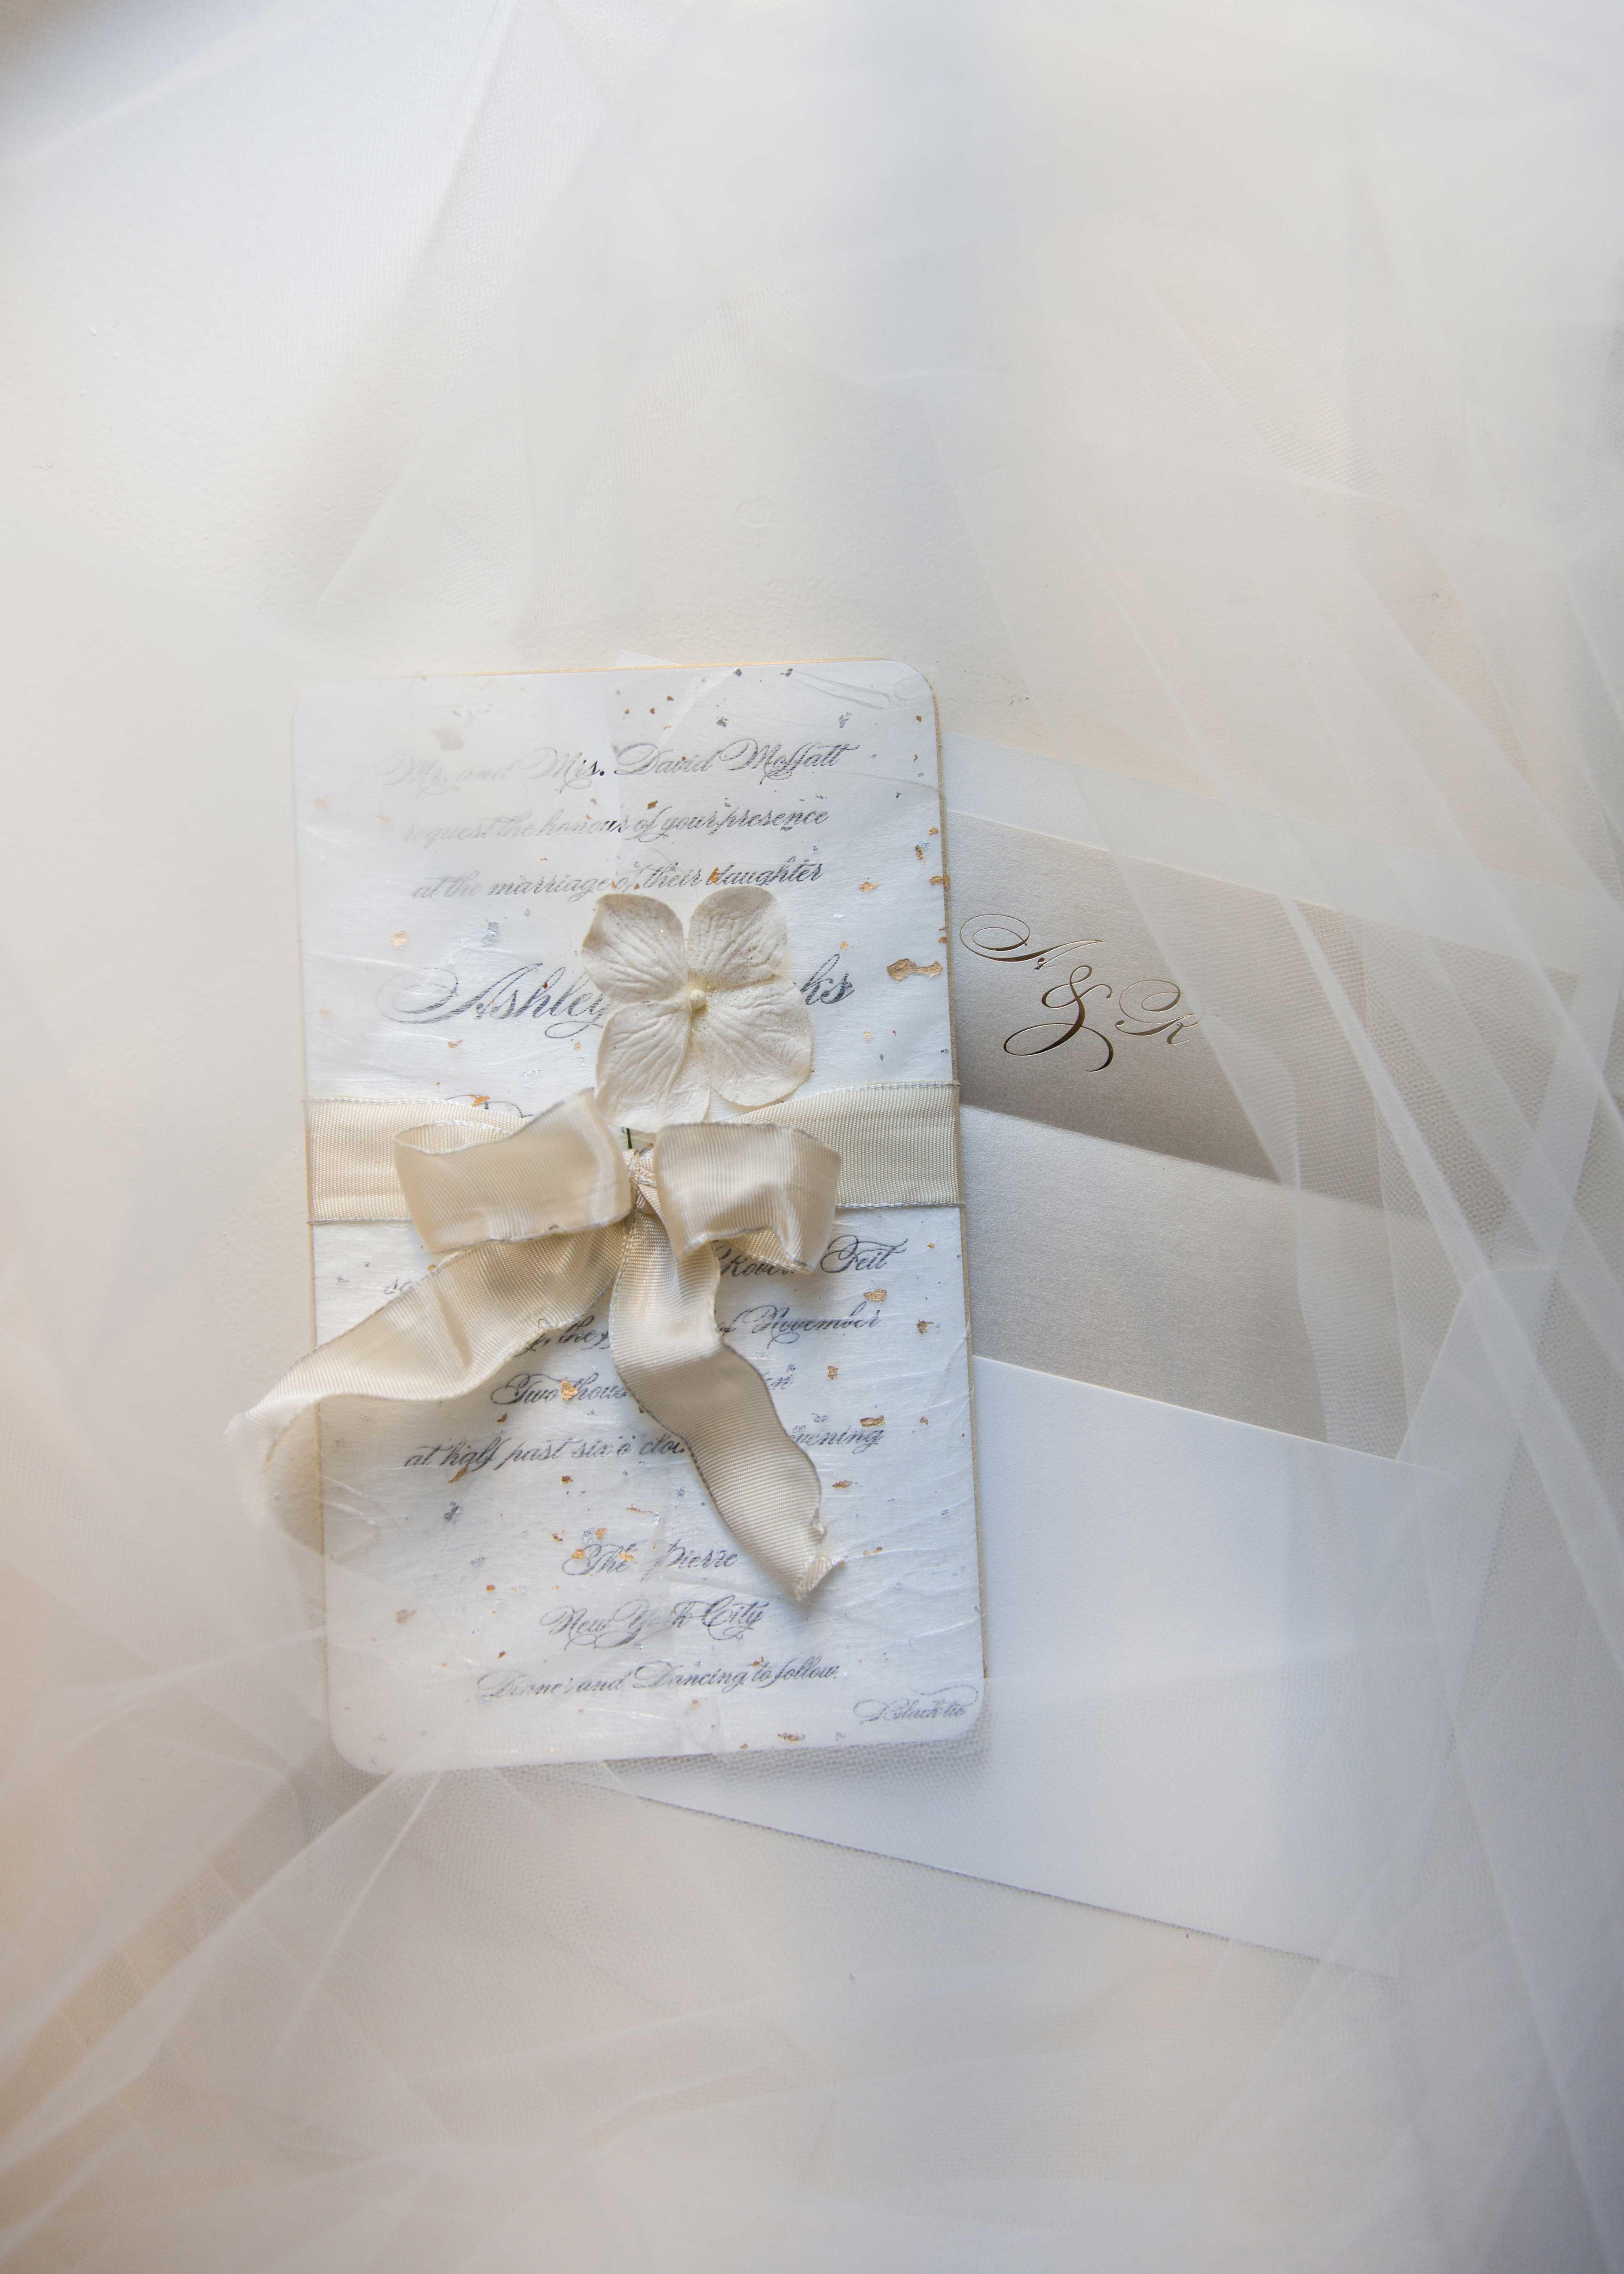 Wedding Ideas: White Elements in Your Wedding Details - Inside Weddings